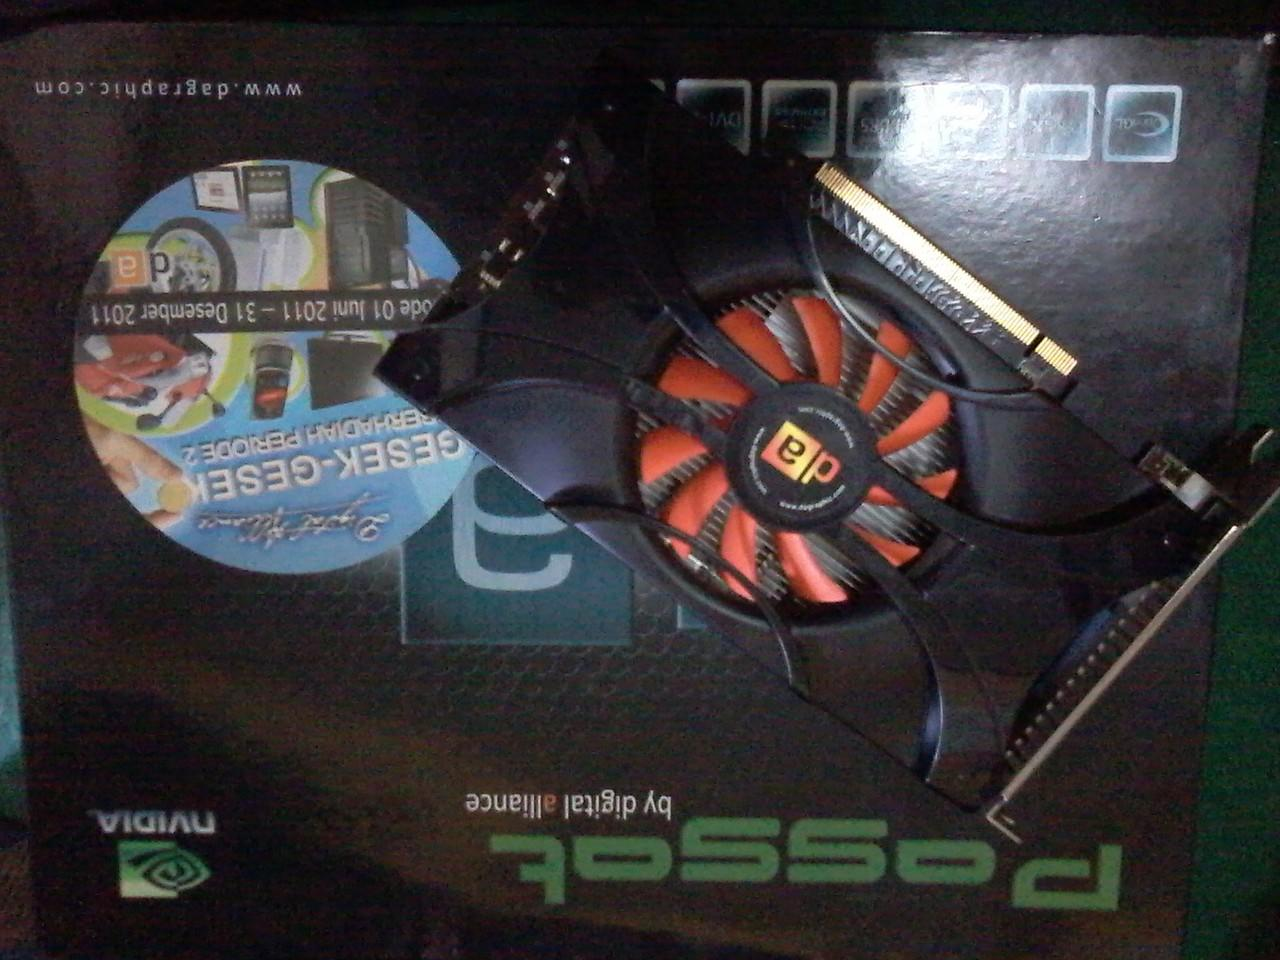 Vga Digital Alliance GTX 550 Ti